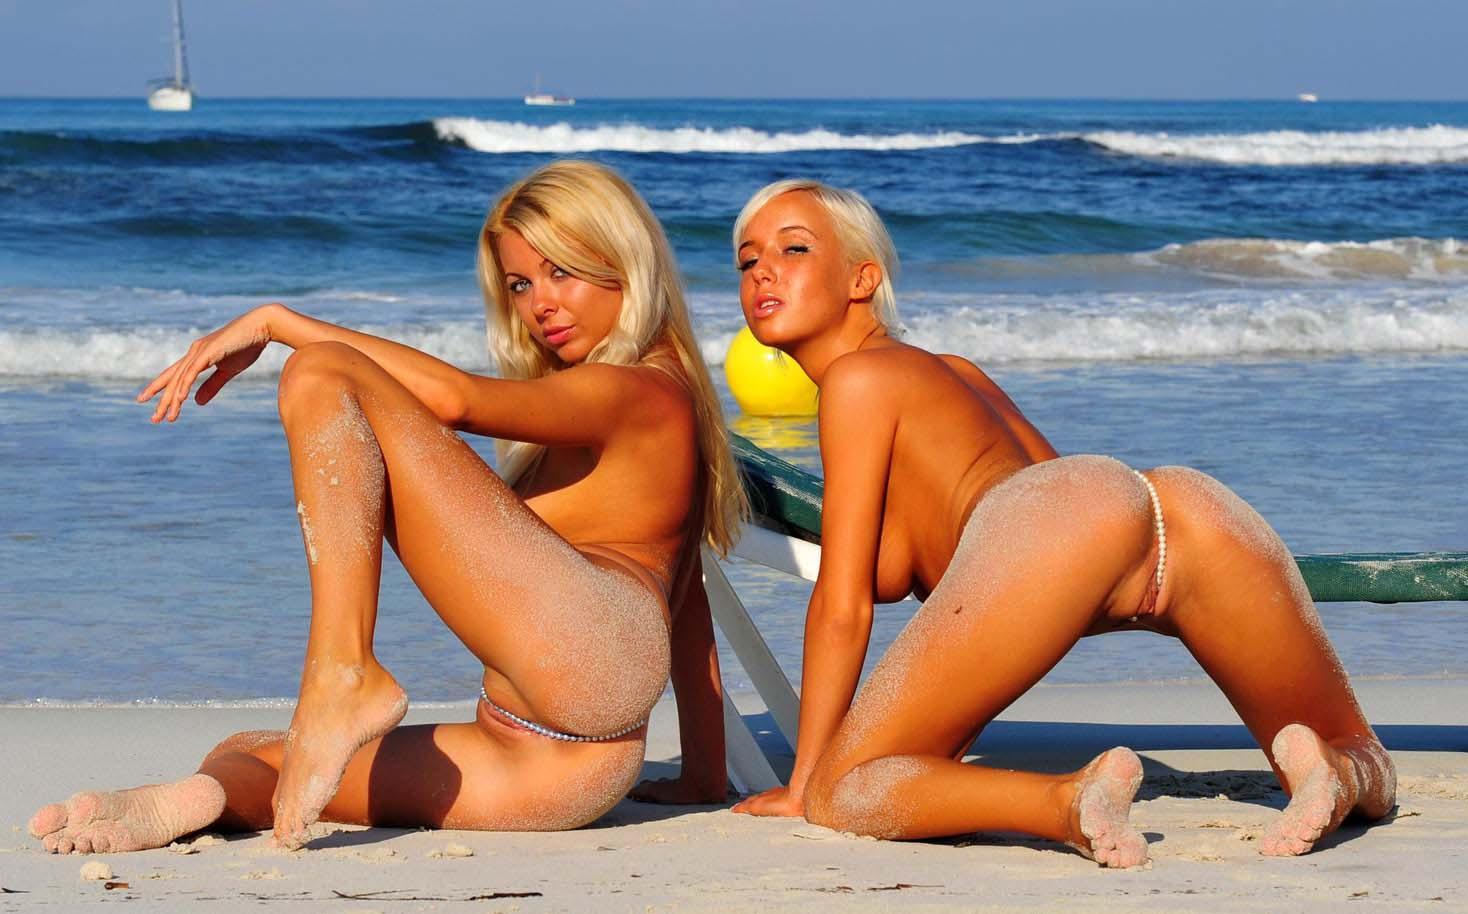 Фото девушек на пляже без бикини 21 фотография